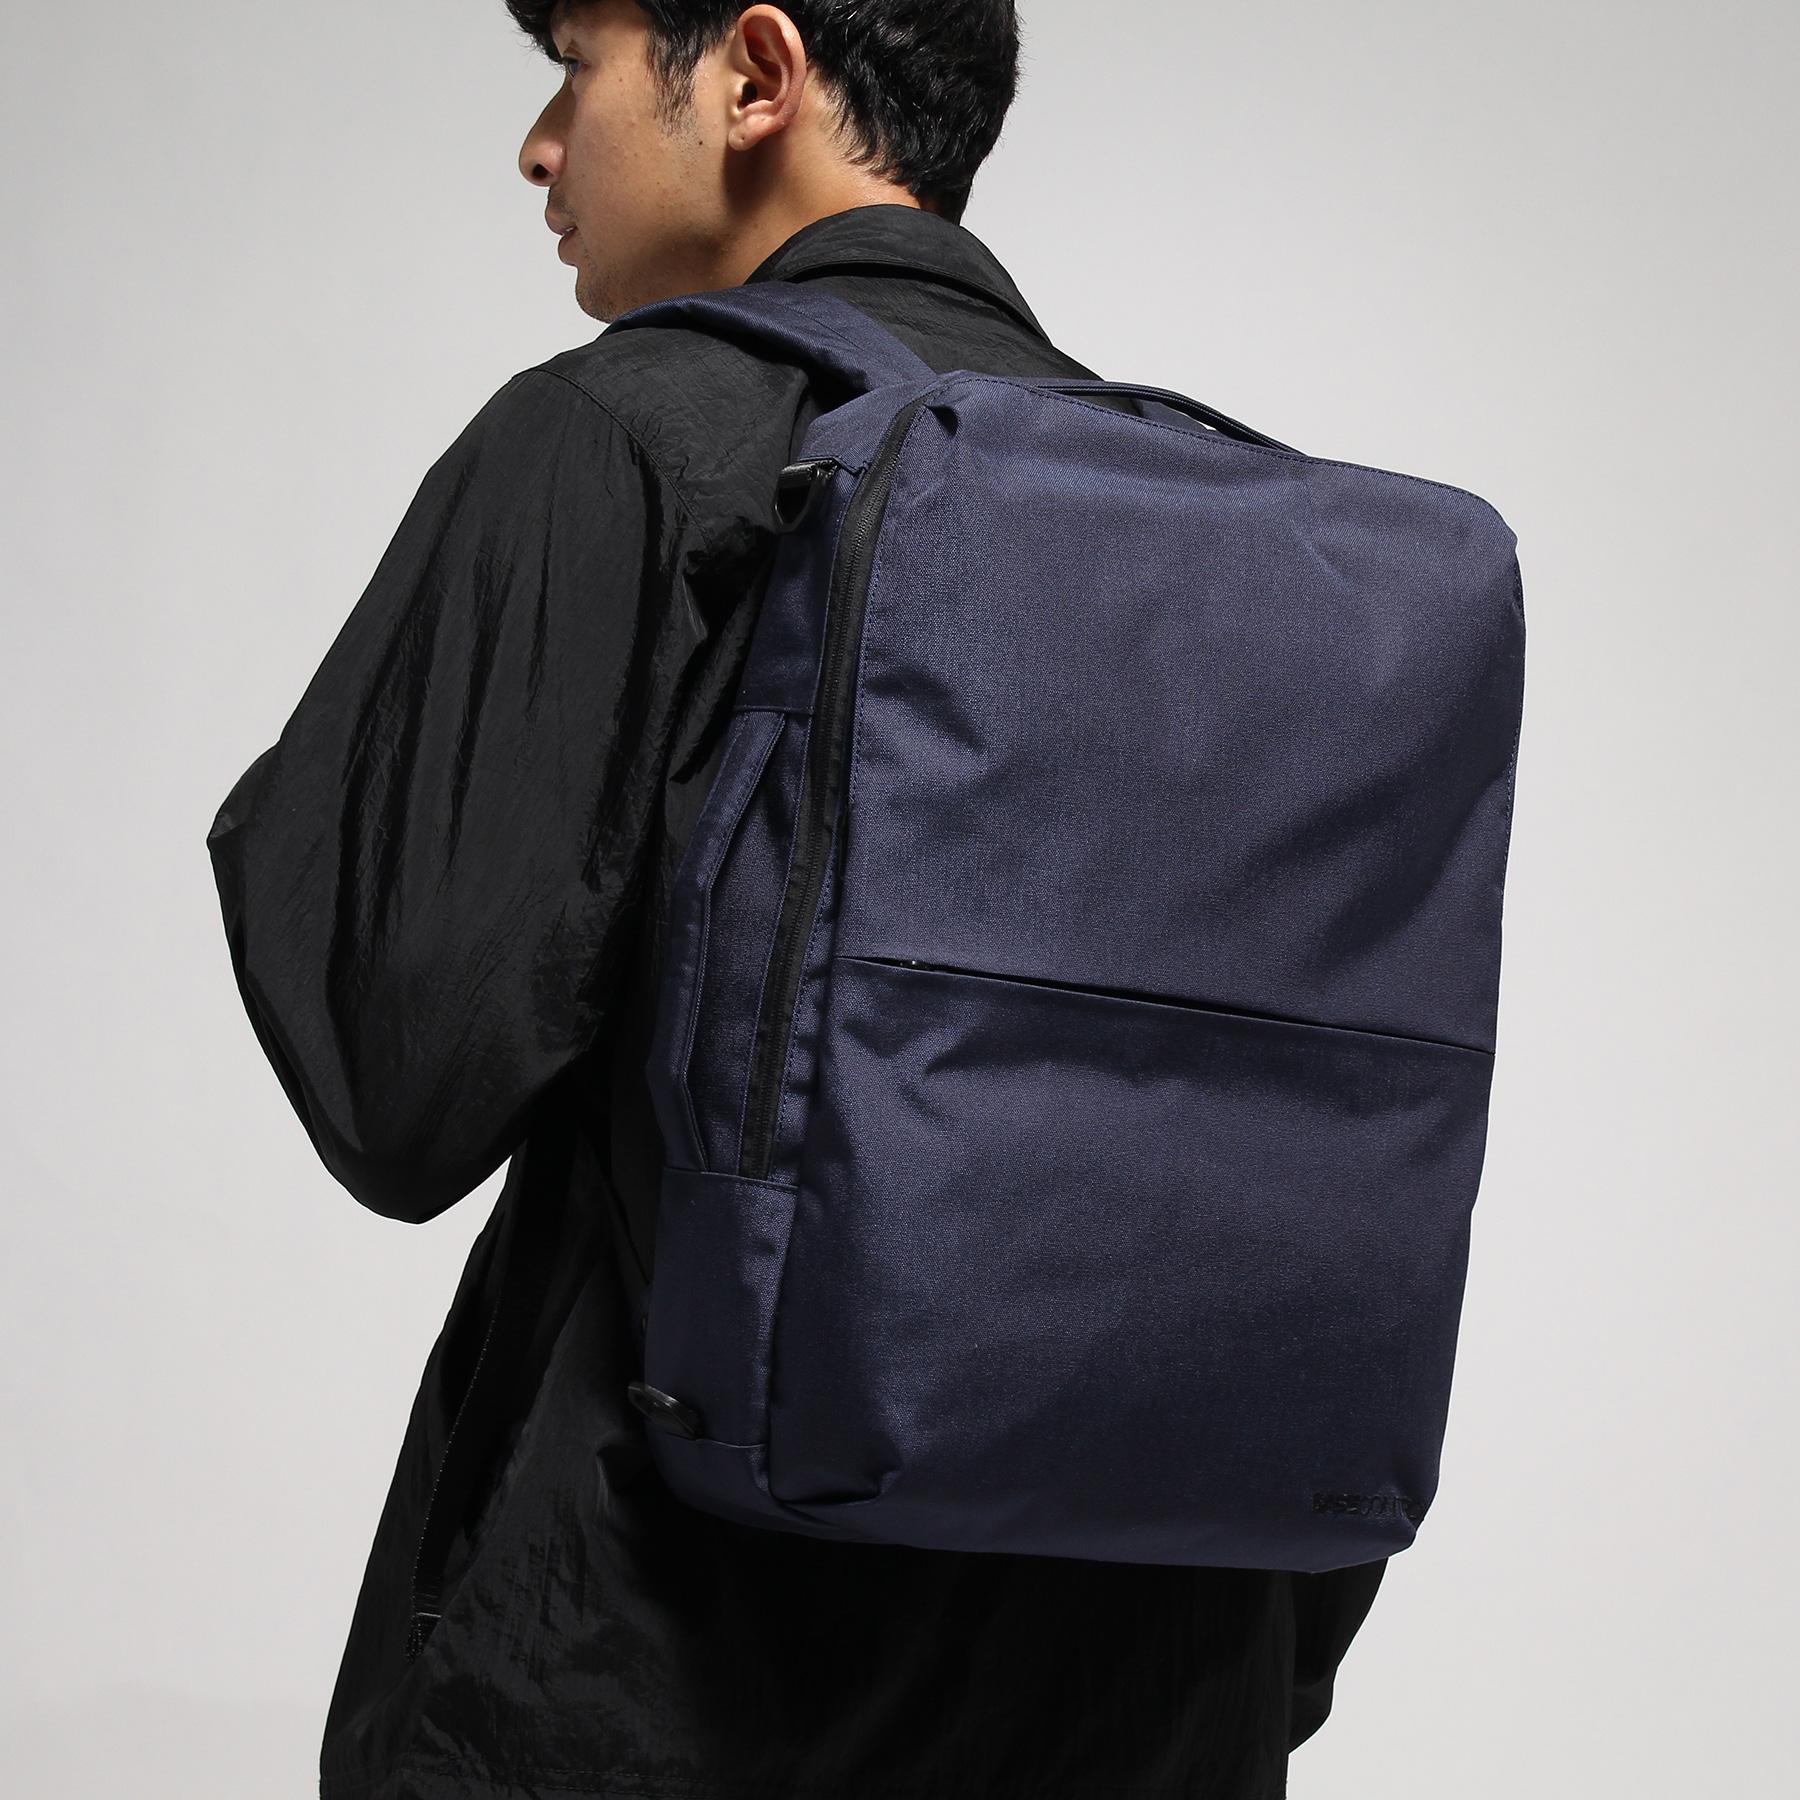 【BASECONTROL (ベース コントロール)】3WAYバックパック コーデュラ・ヘザー スミスメンズ バッグ バックパック・リュック ブルー系